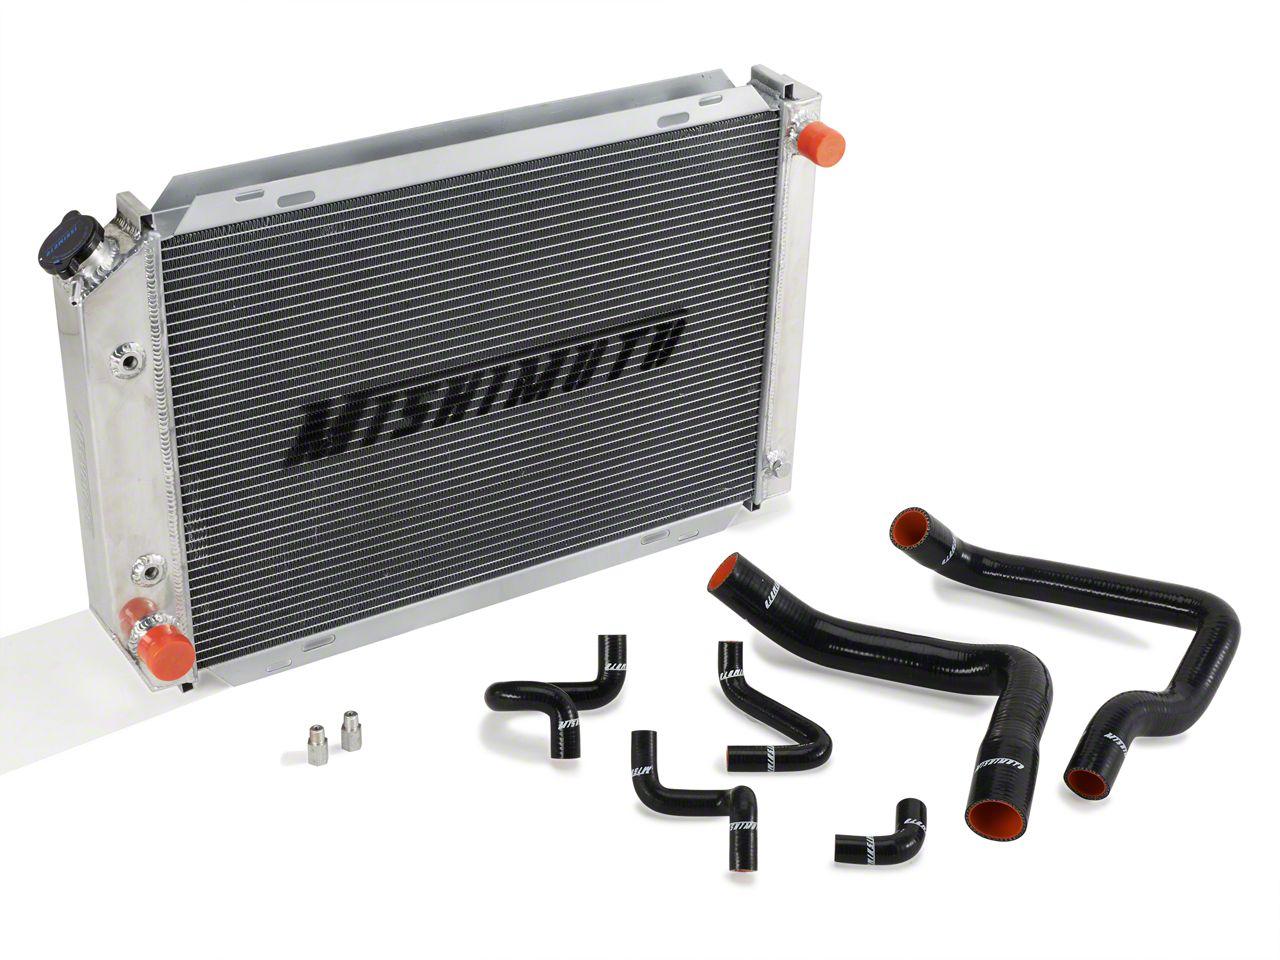 Mishimoto Radiator and Silicone Hose Kit (86-93 5.0L w/ Automatic Transmission)